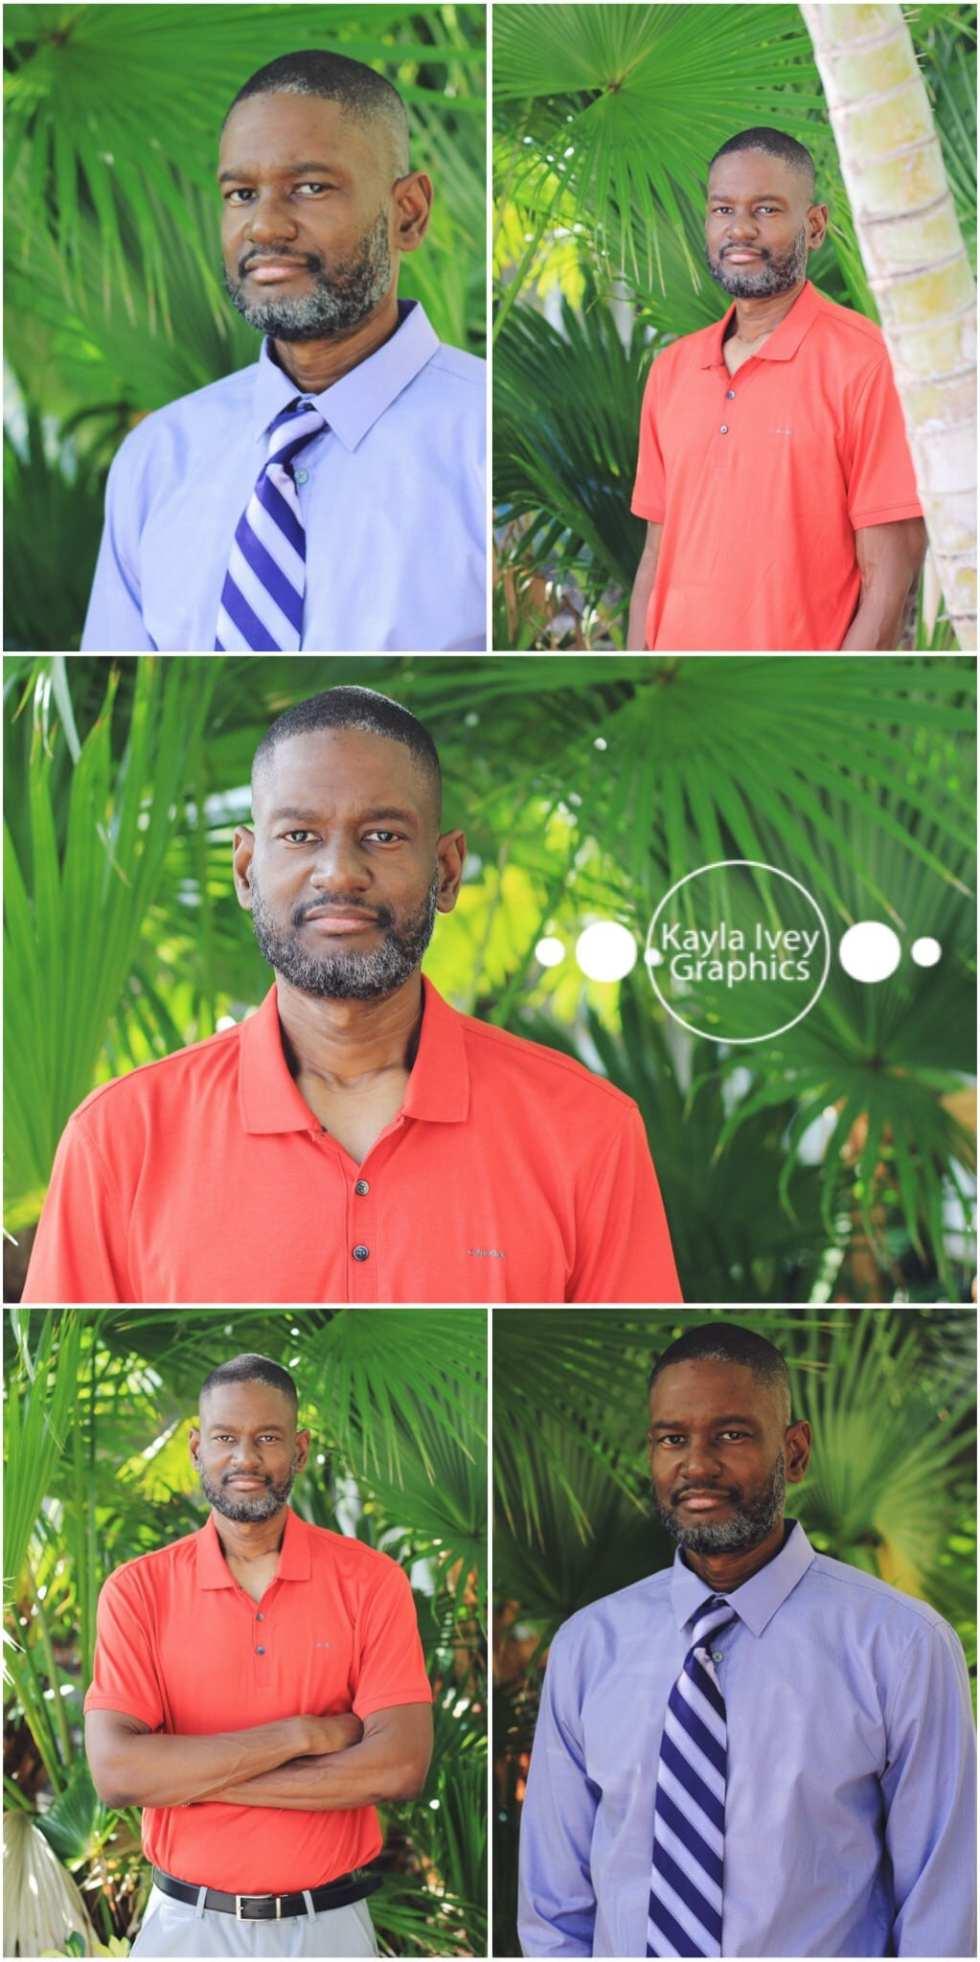 Karsten Business Professional Portrait Headshots